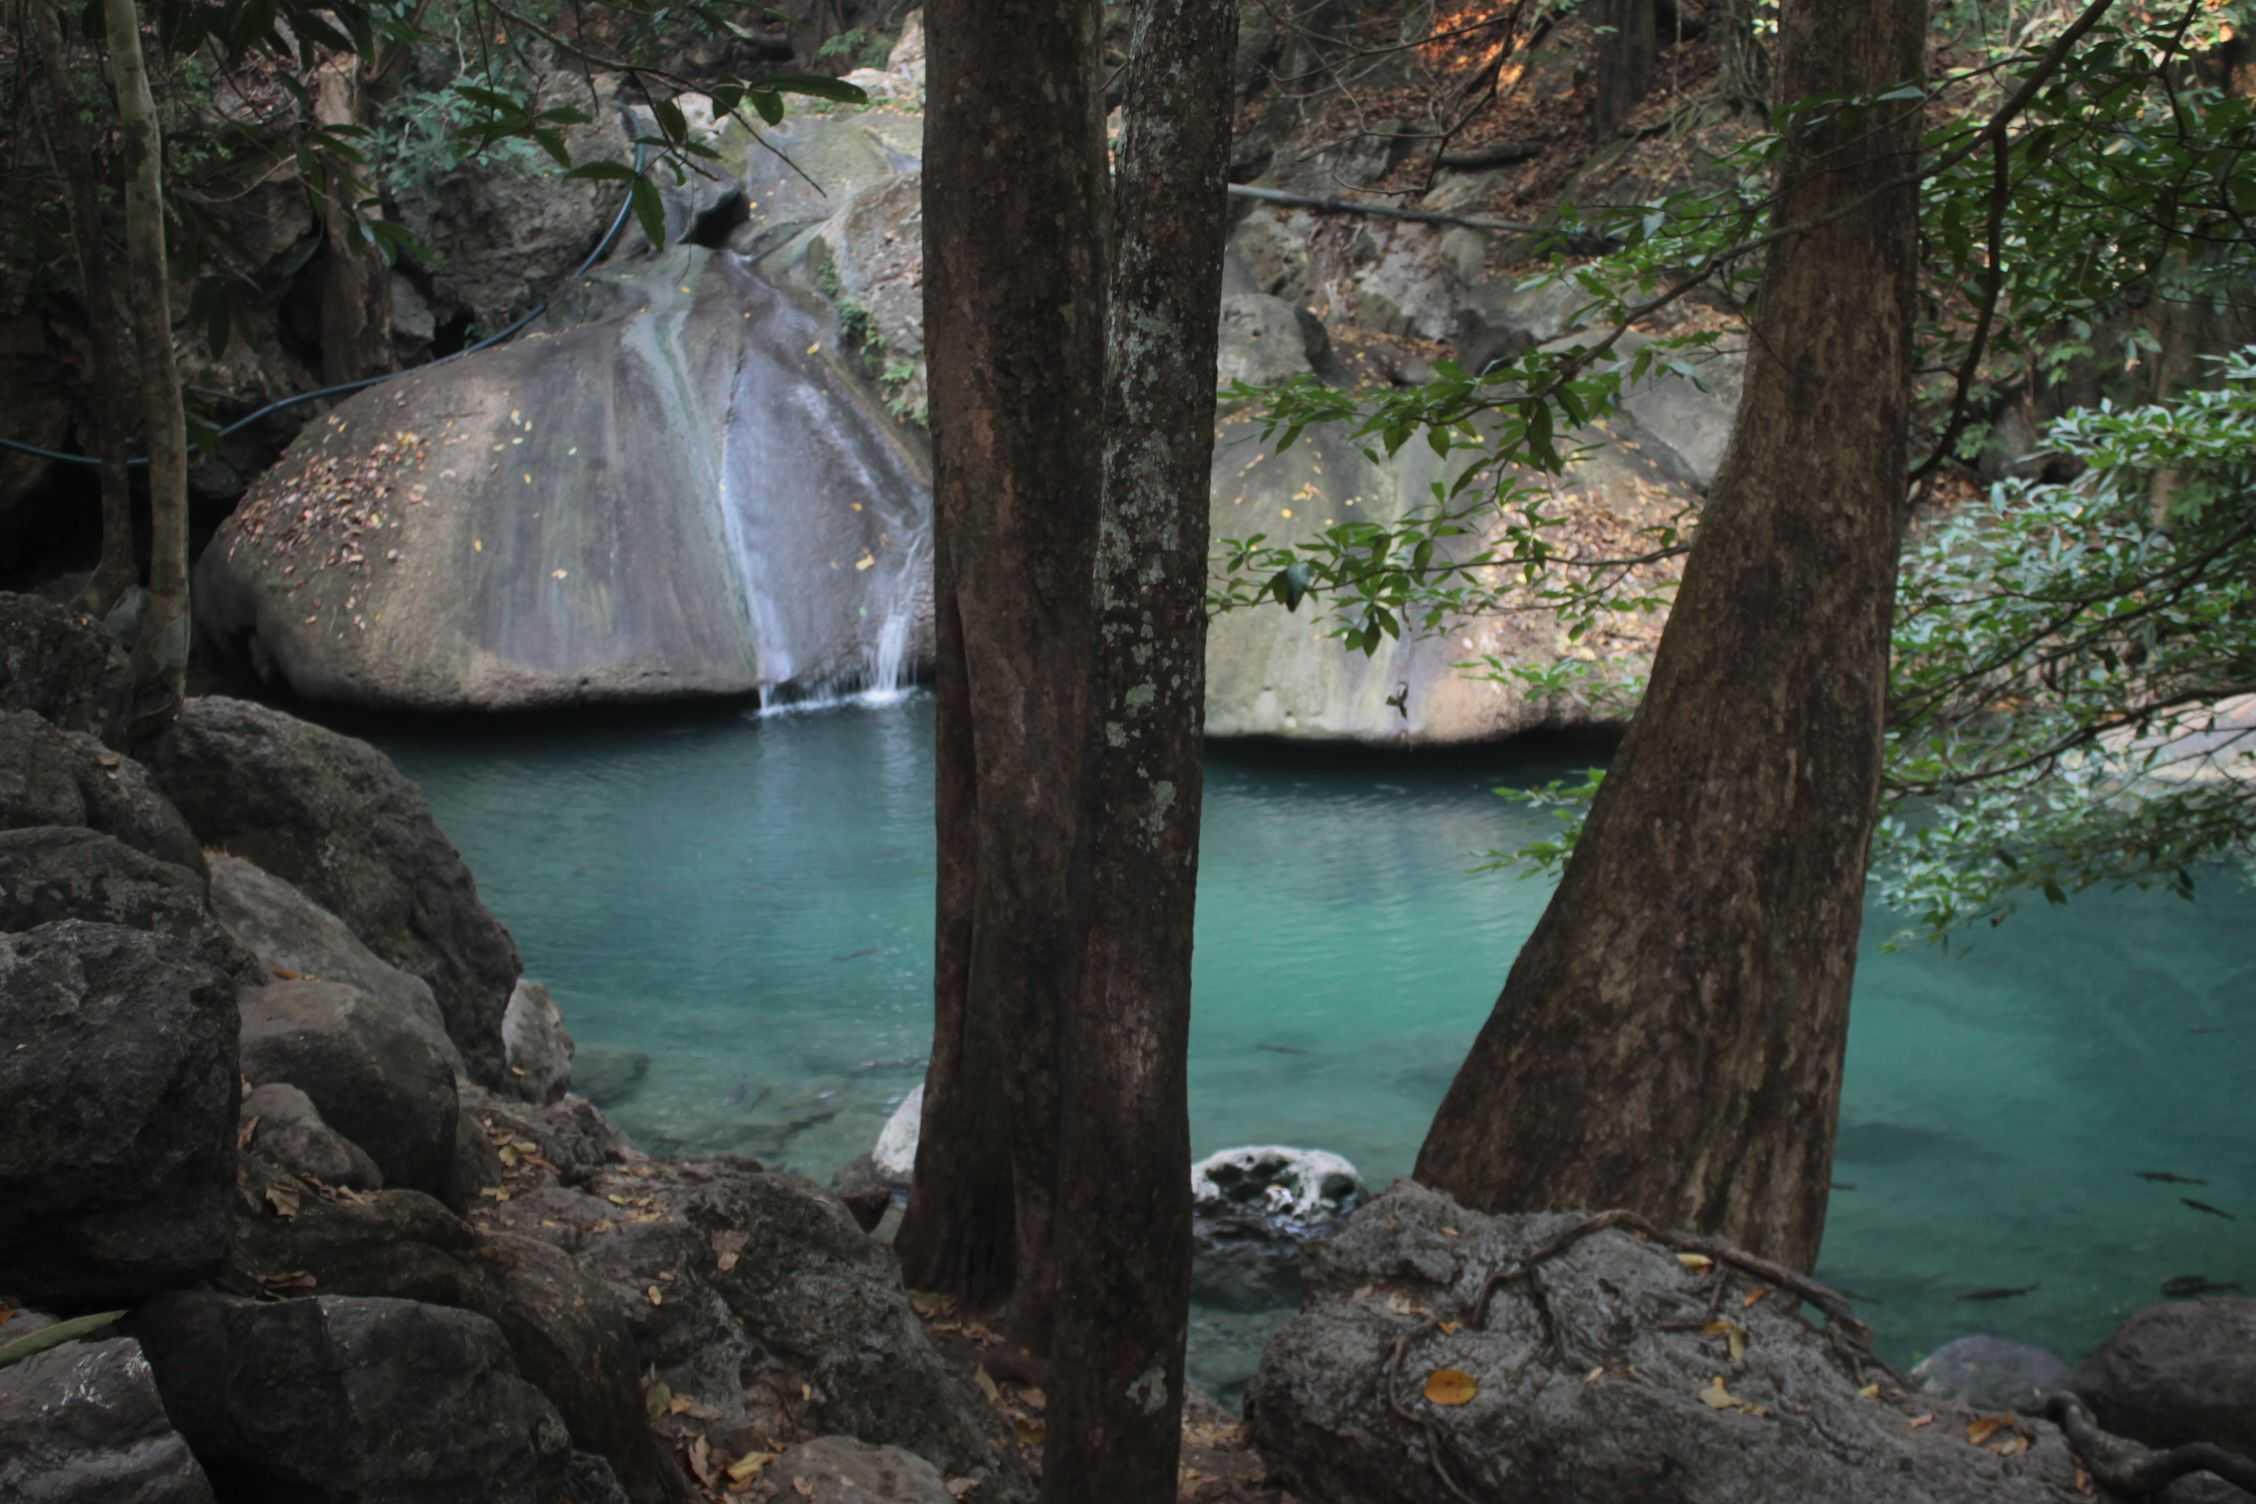 CUarto nivel de las cascadas